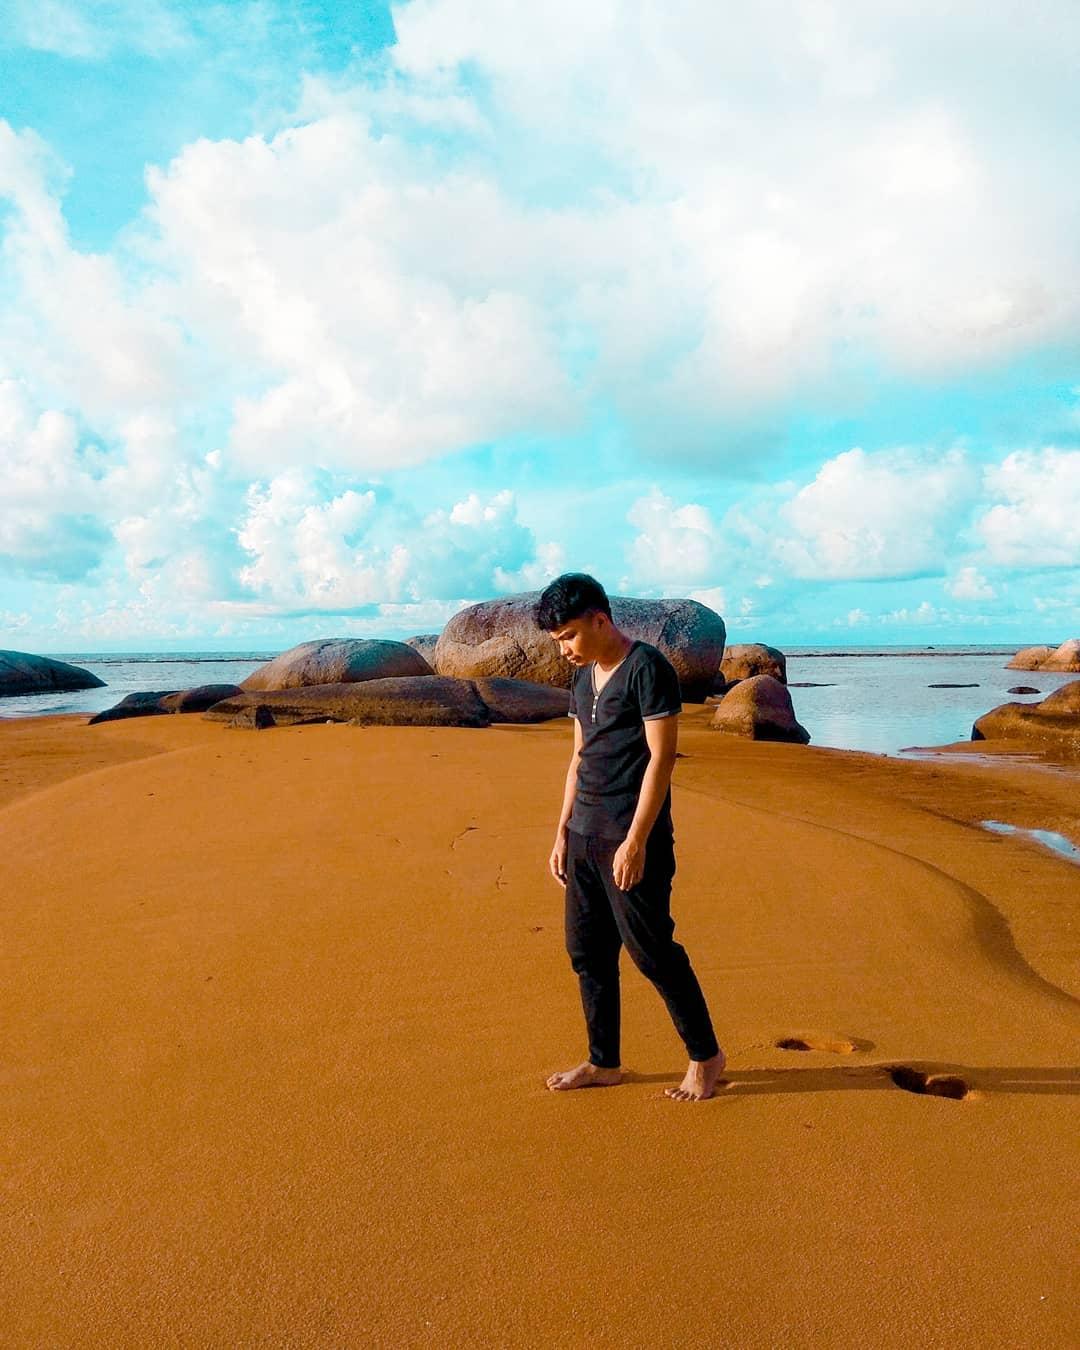 Tanjung senubing Natuna Island